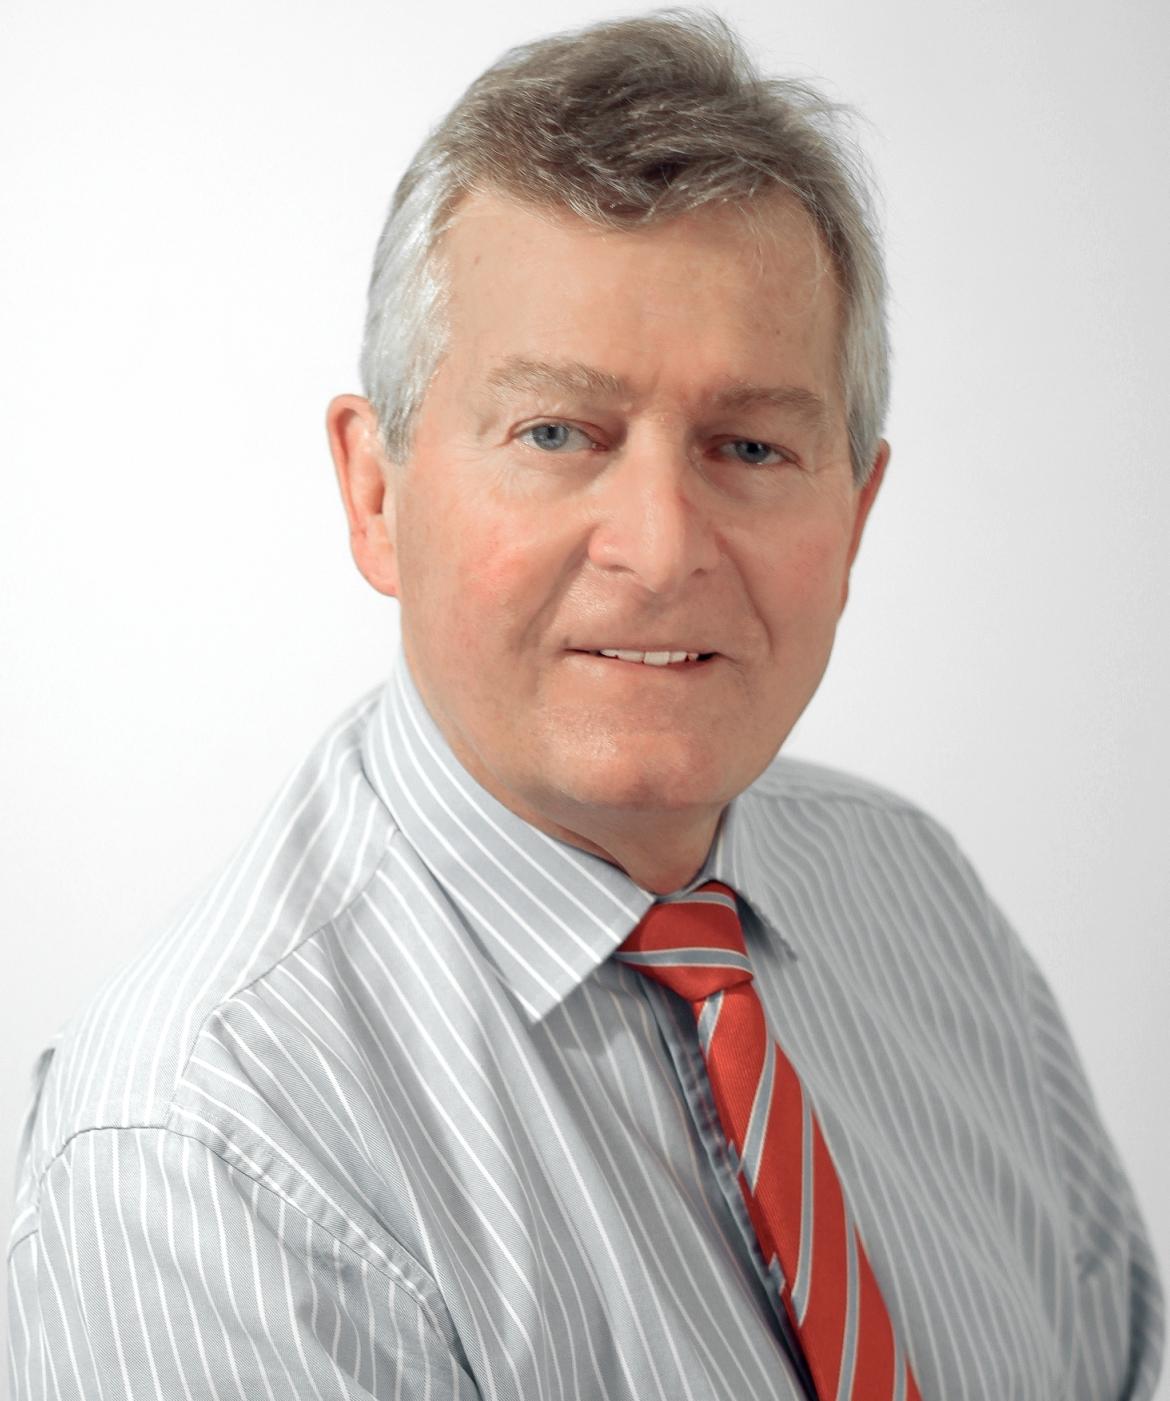 Guy Wheatcroft